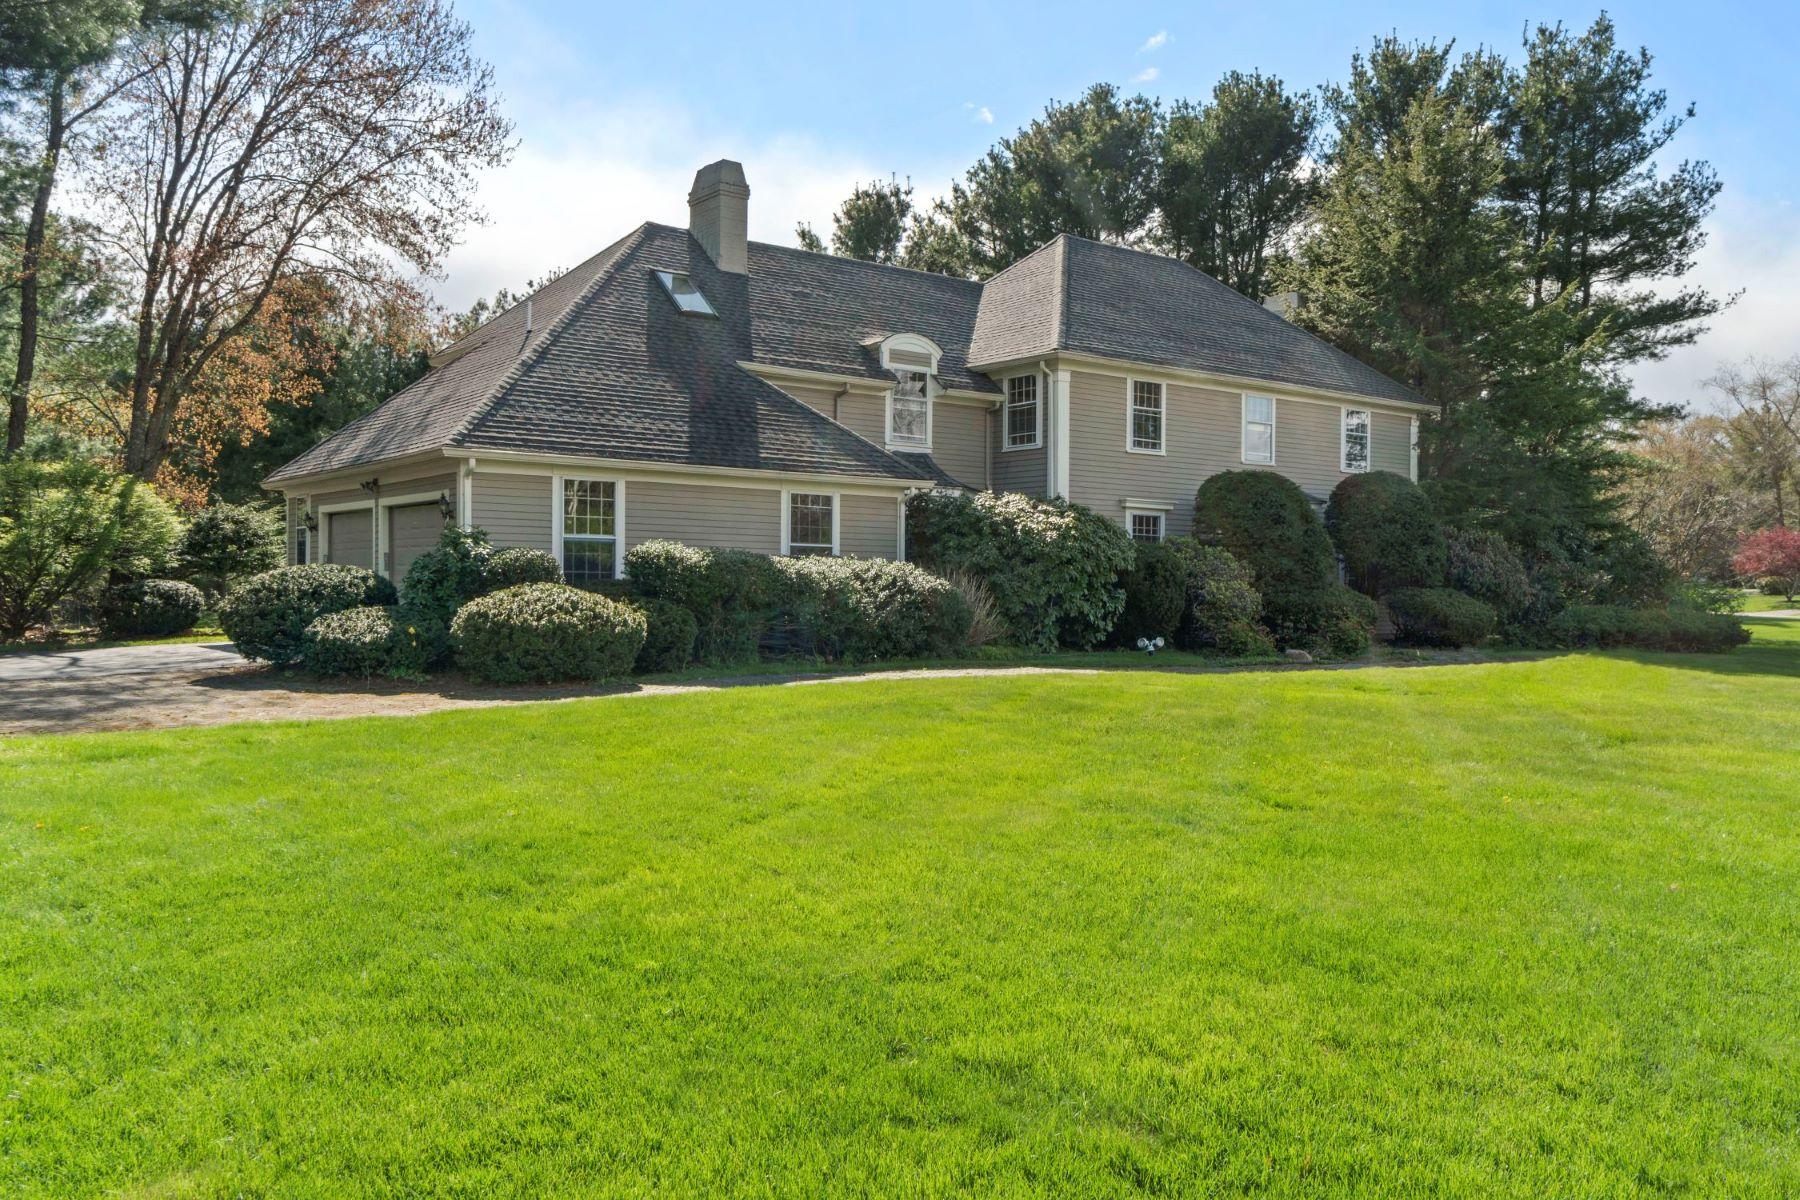 Single Family Homes για την Πώληση στο 145 Buckskin Drive Wayland, Μασαχουσετη 01778 Ηνωμένες Πολιτείες